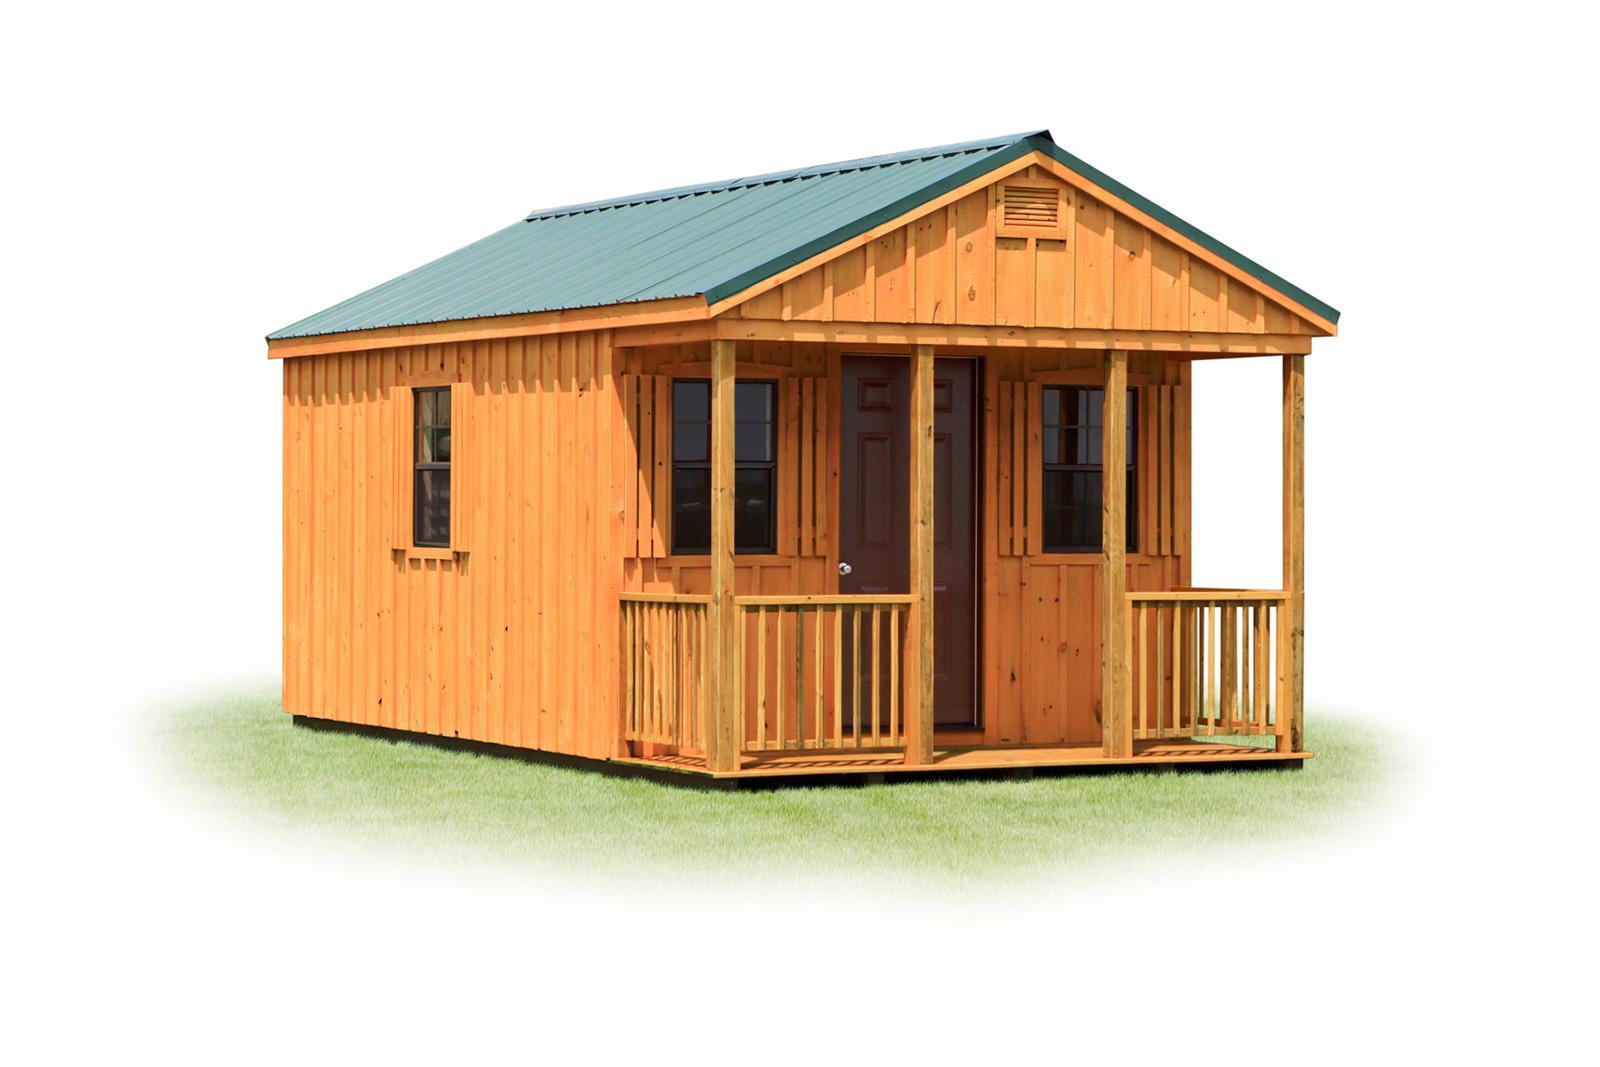 Village Shed Store A-frame Cabin